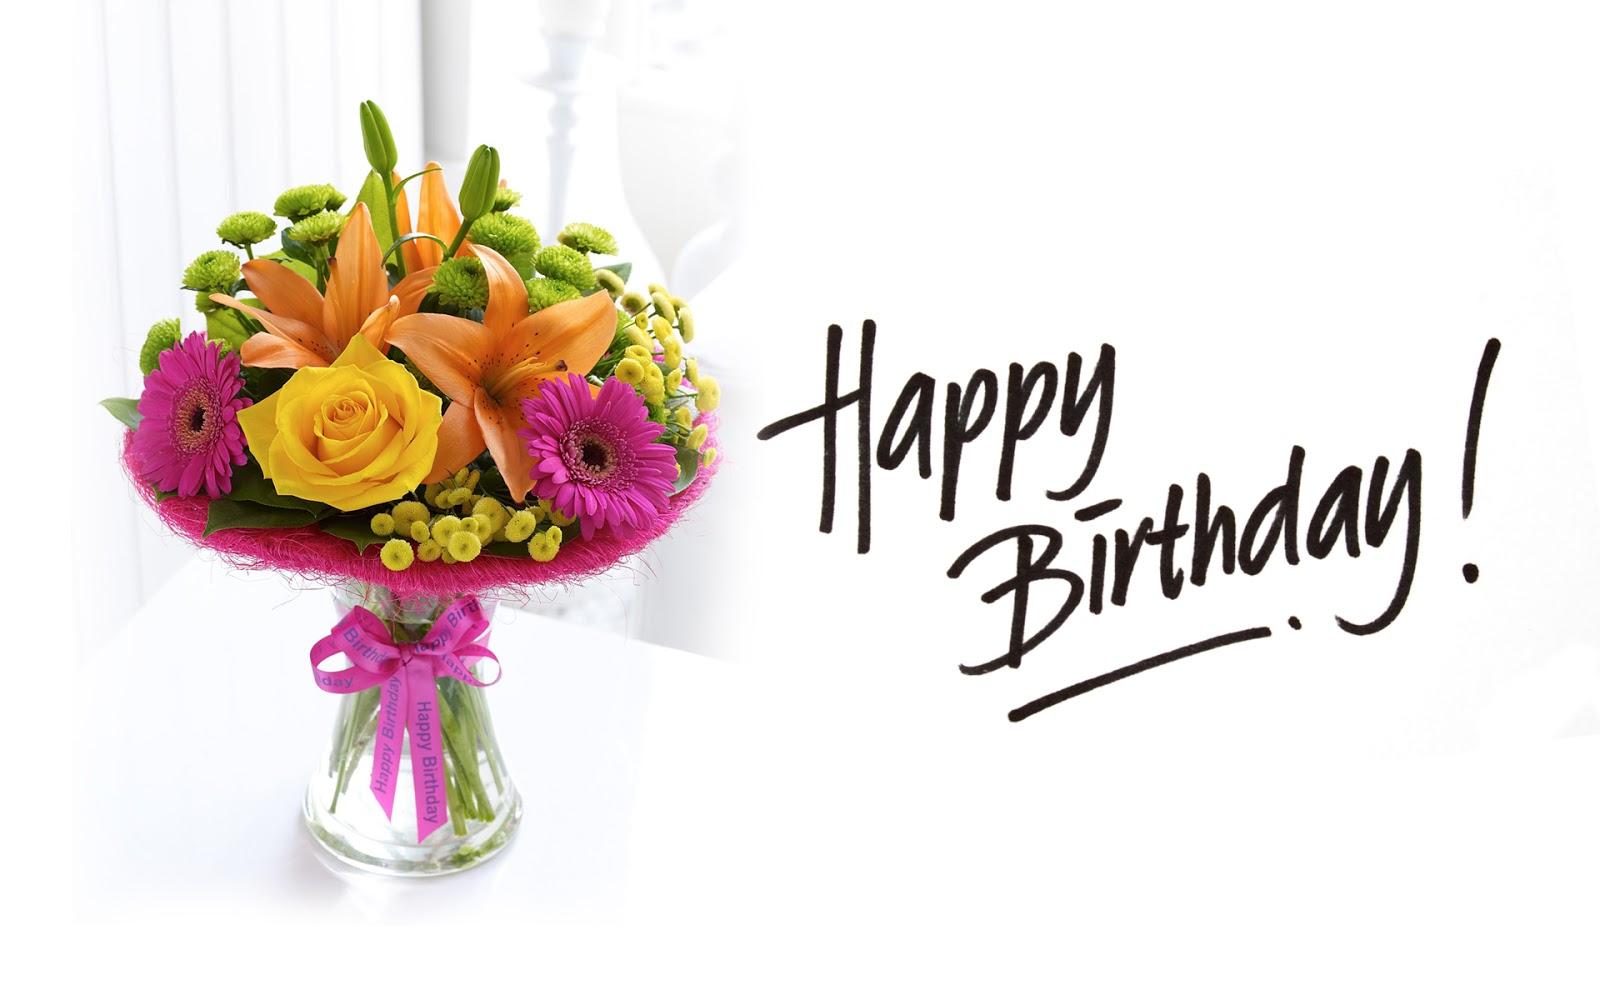 Happy birthday wishes images flowers shareimages happy birthday animation ecards share free greeting postcards images izmirmasajfo